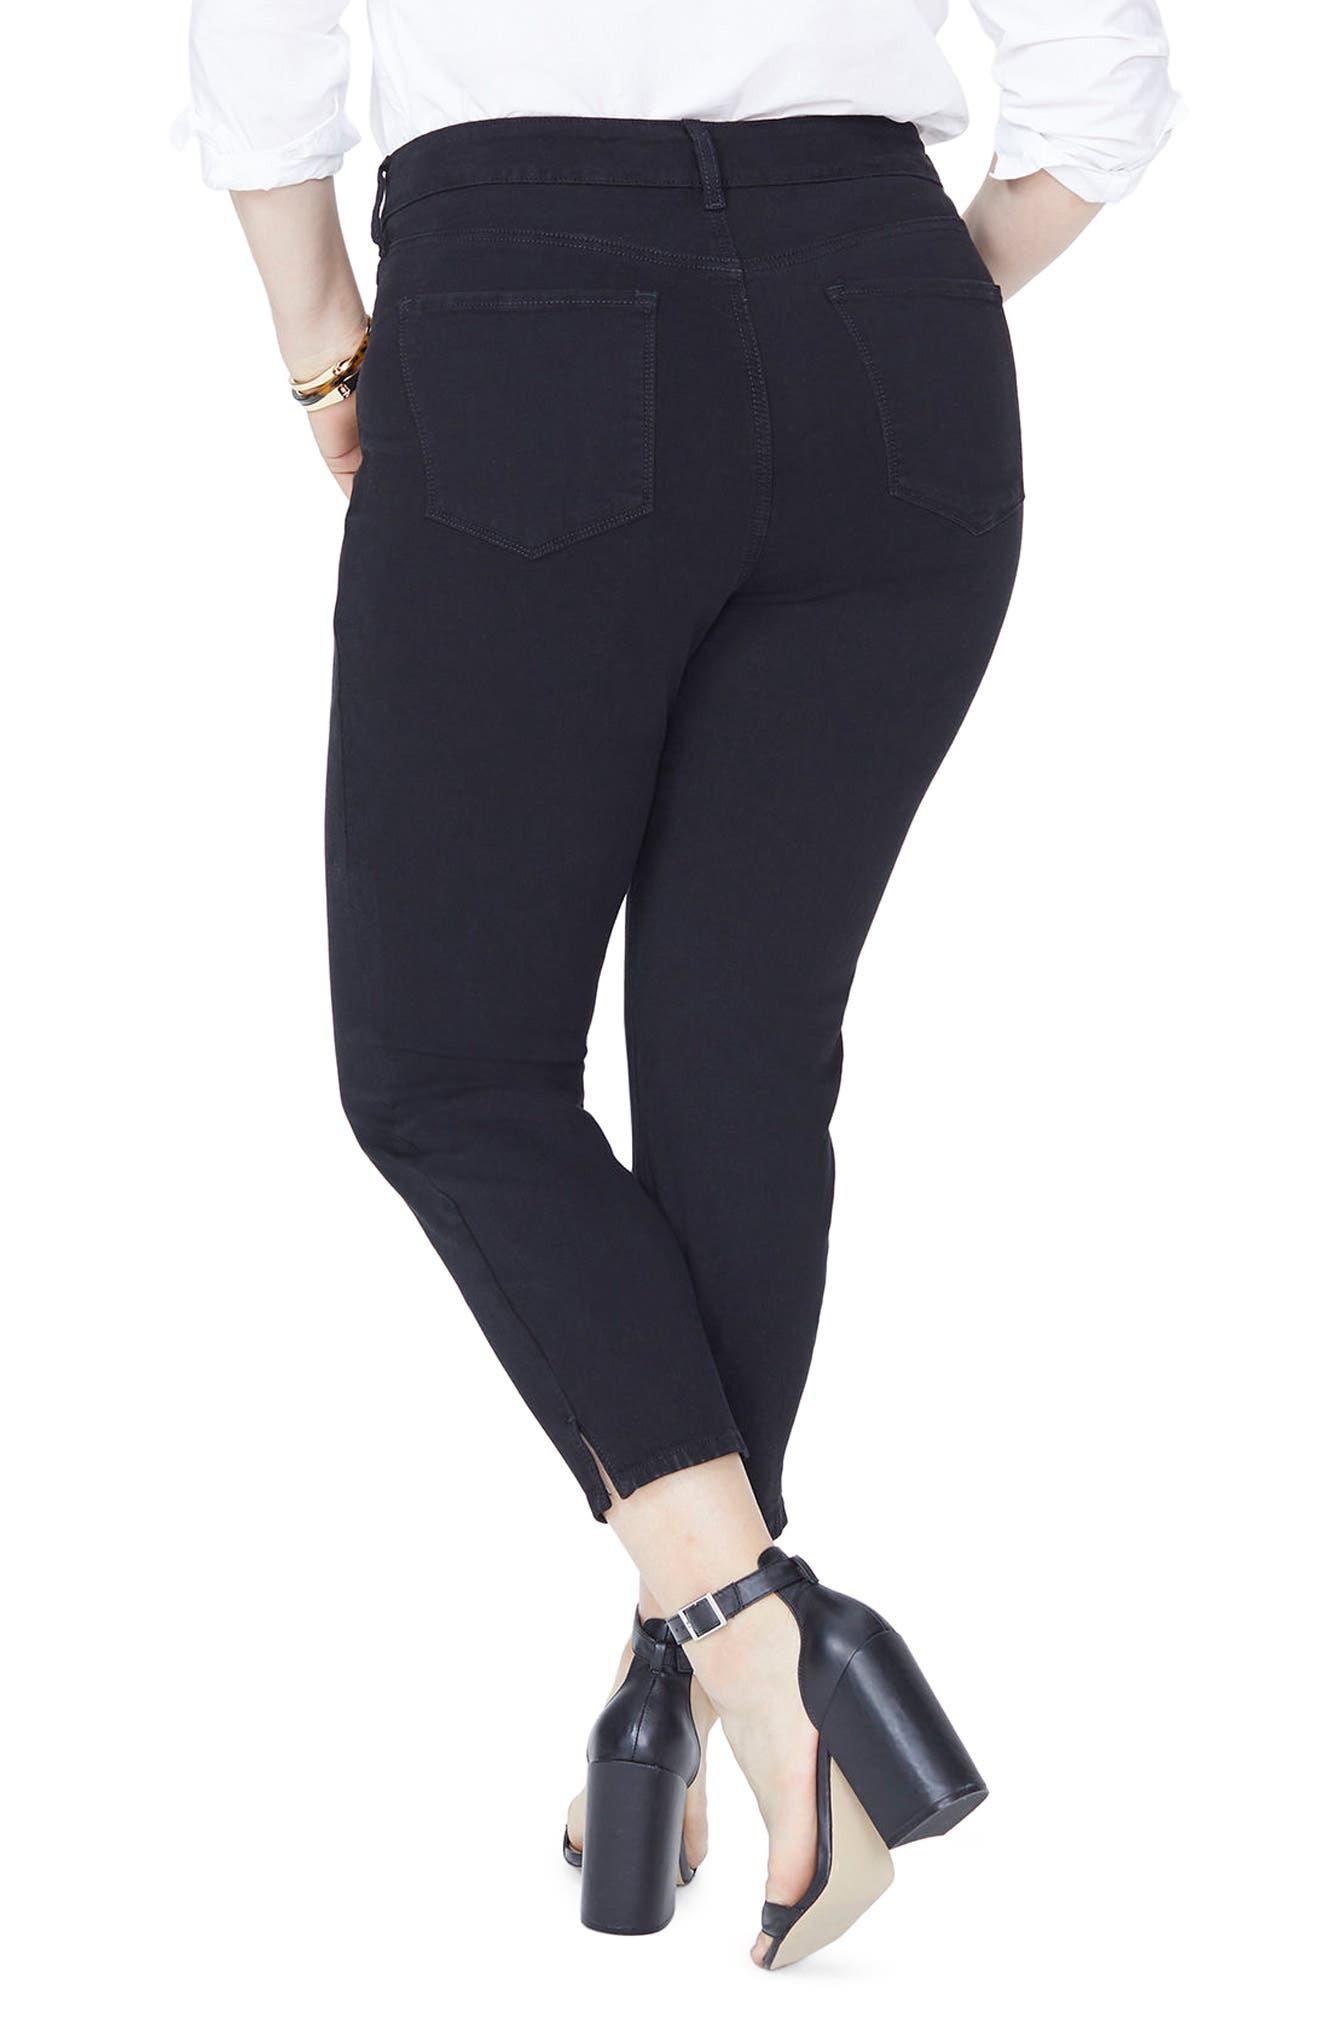 Ami Ankle Skinny Jeans,                             Alternate thumbnail 2, color,                             Black